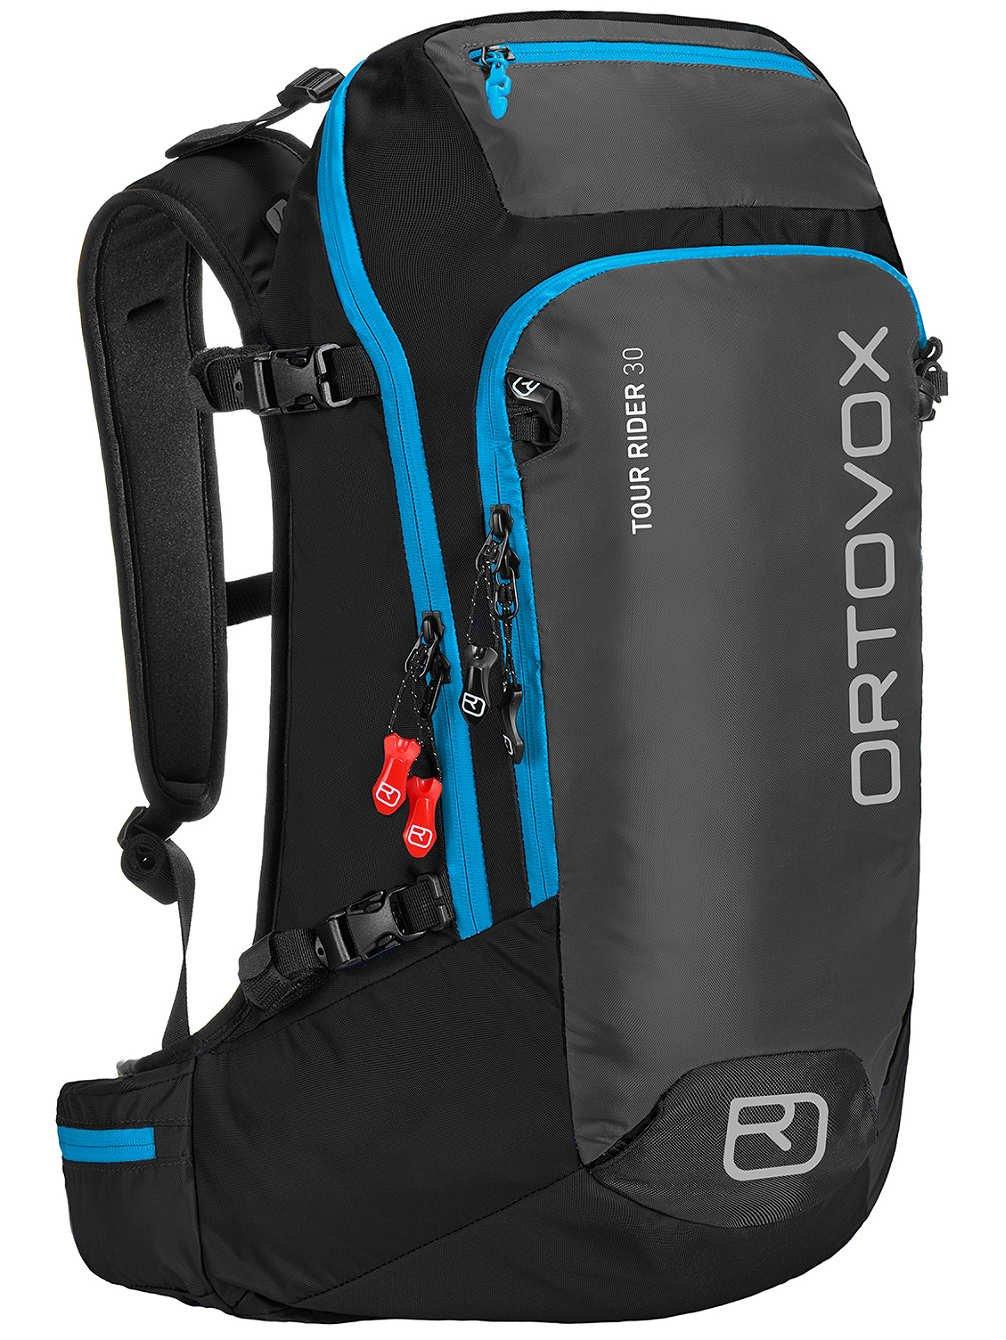 ORTOVOX(オルトボックス) TOUR RIDER 30 (ツアーライダー30) B00X879ZUSBK ブラック